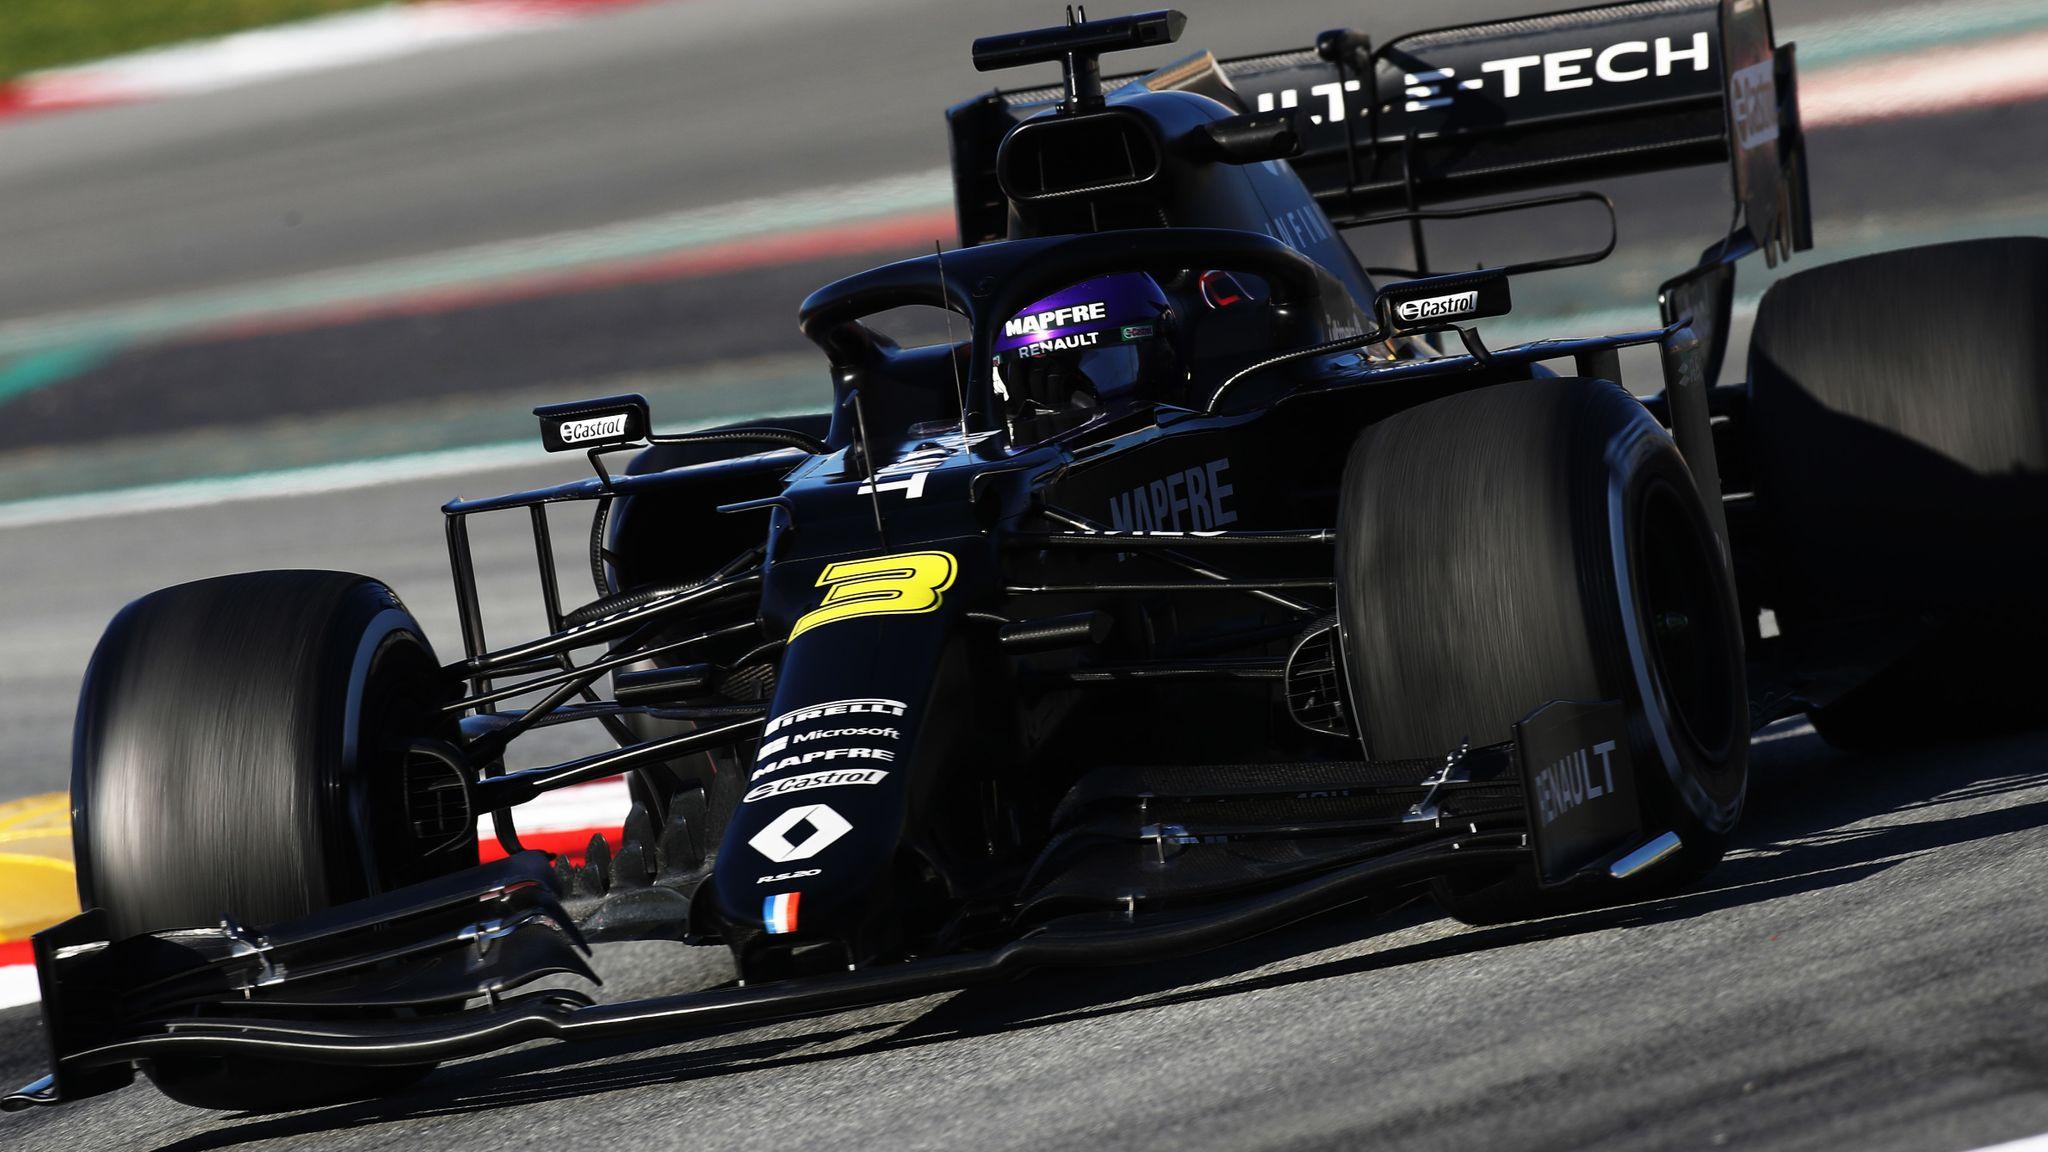 F1 Testing Test Two Day Three Am Daniel Ricciardo Ahead For Renault F1 News